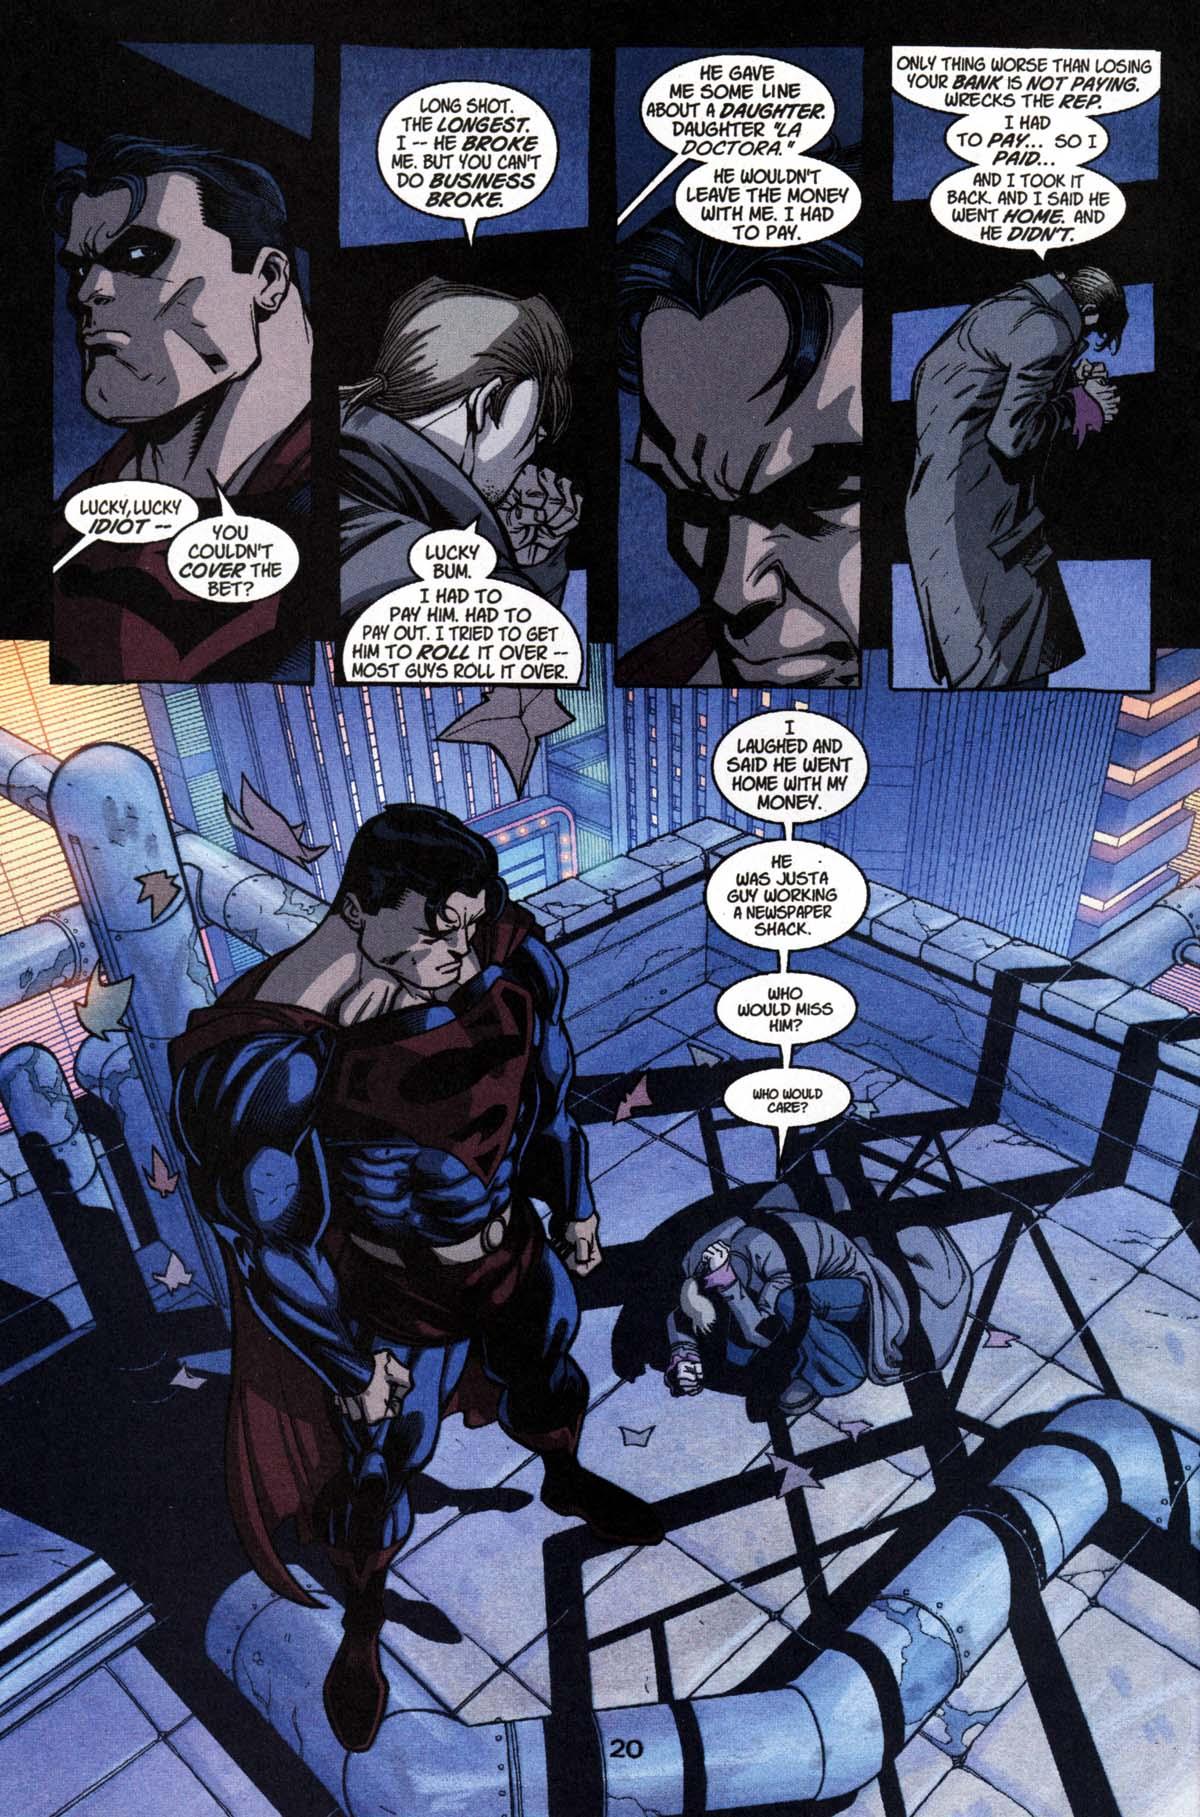 Action Comics (1938) 792 Page 20